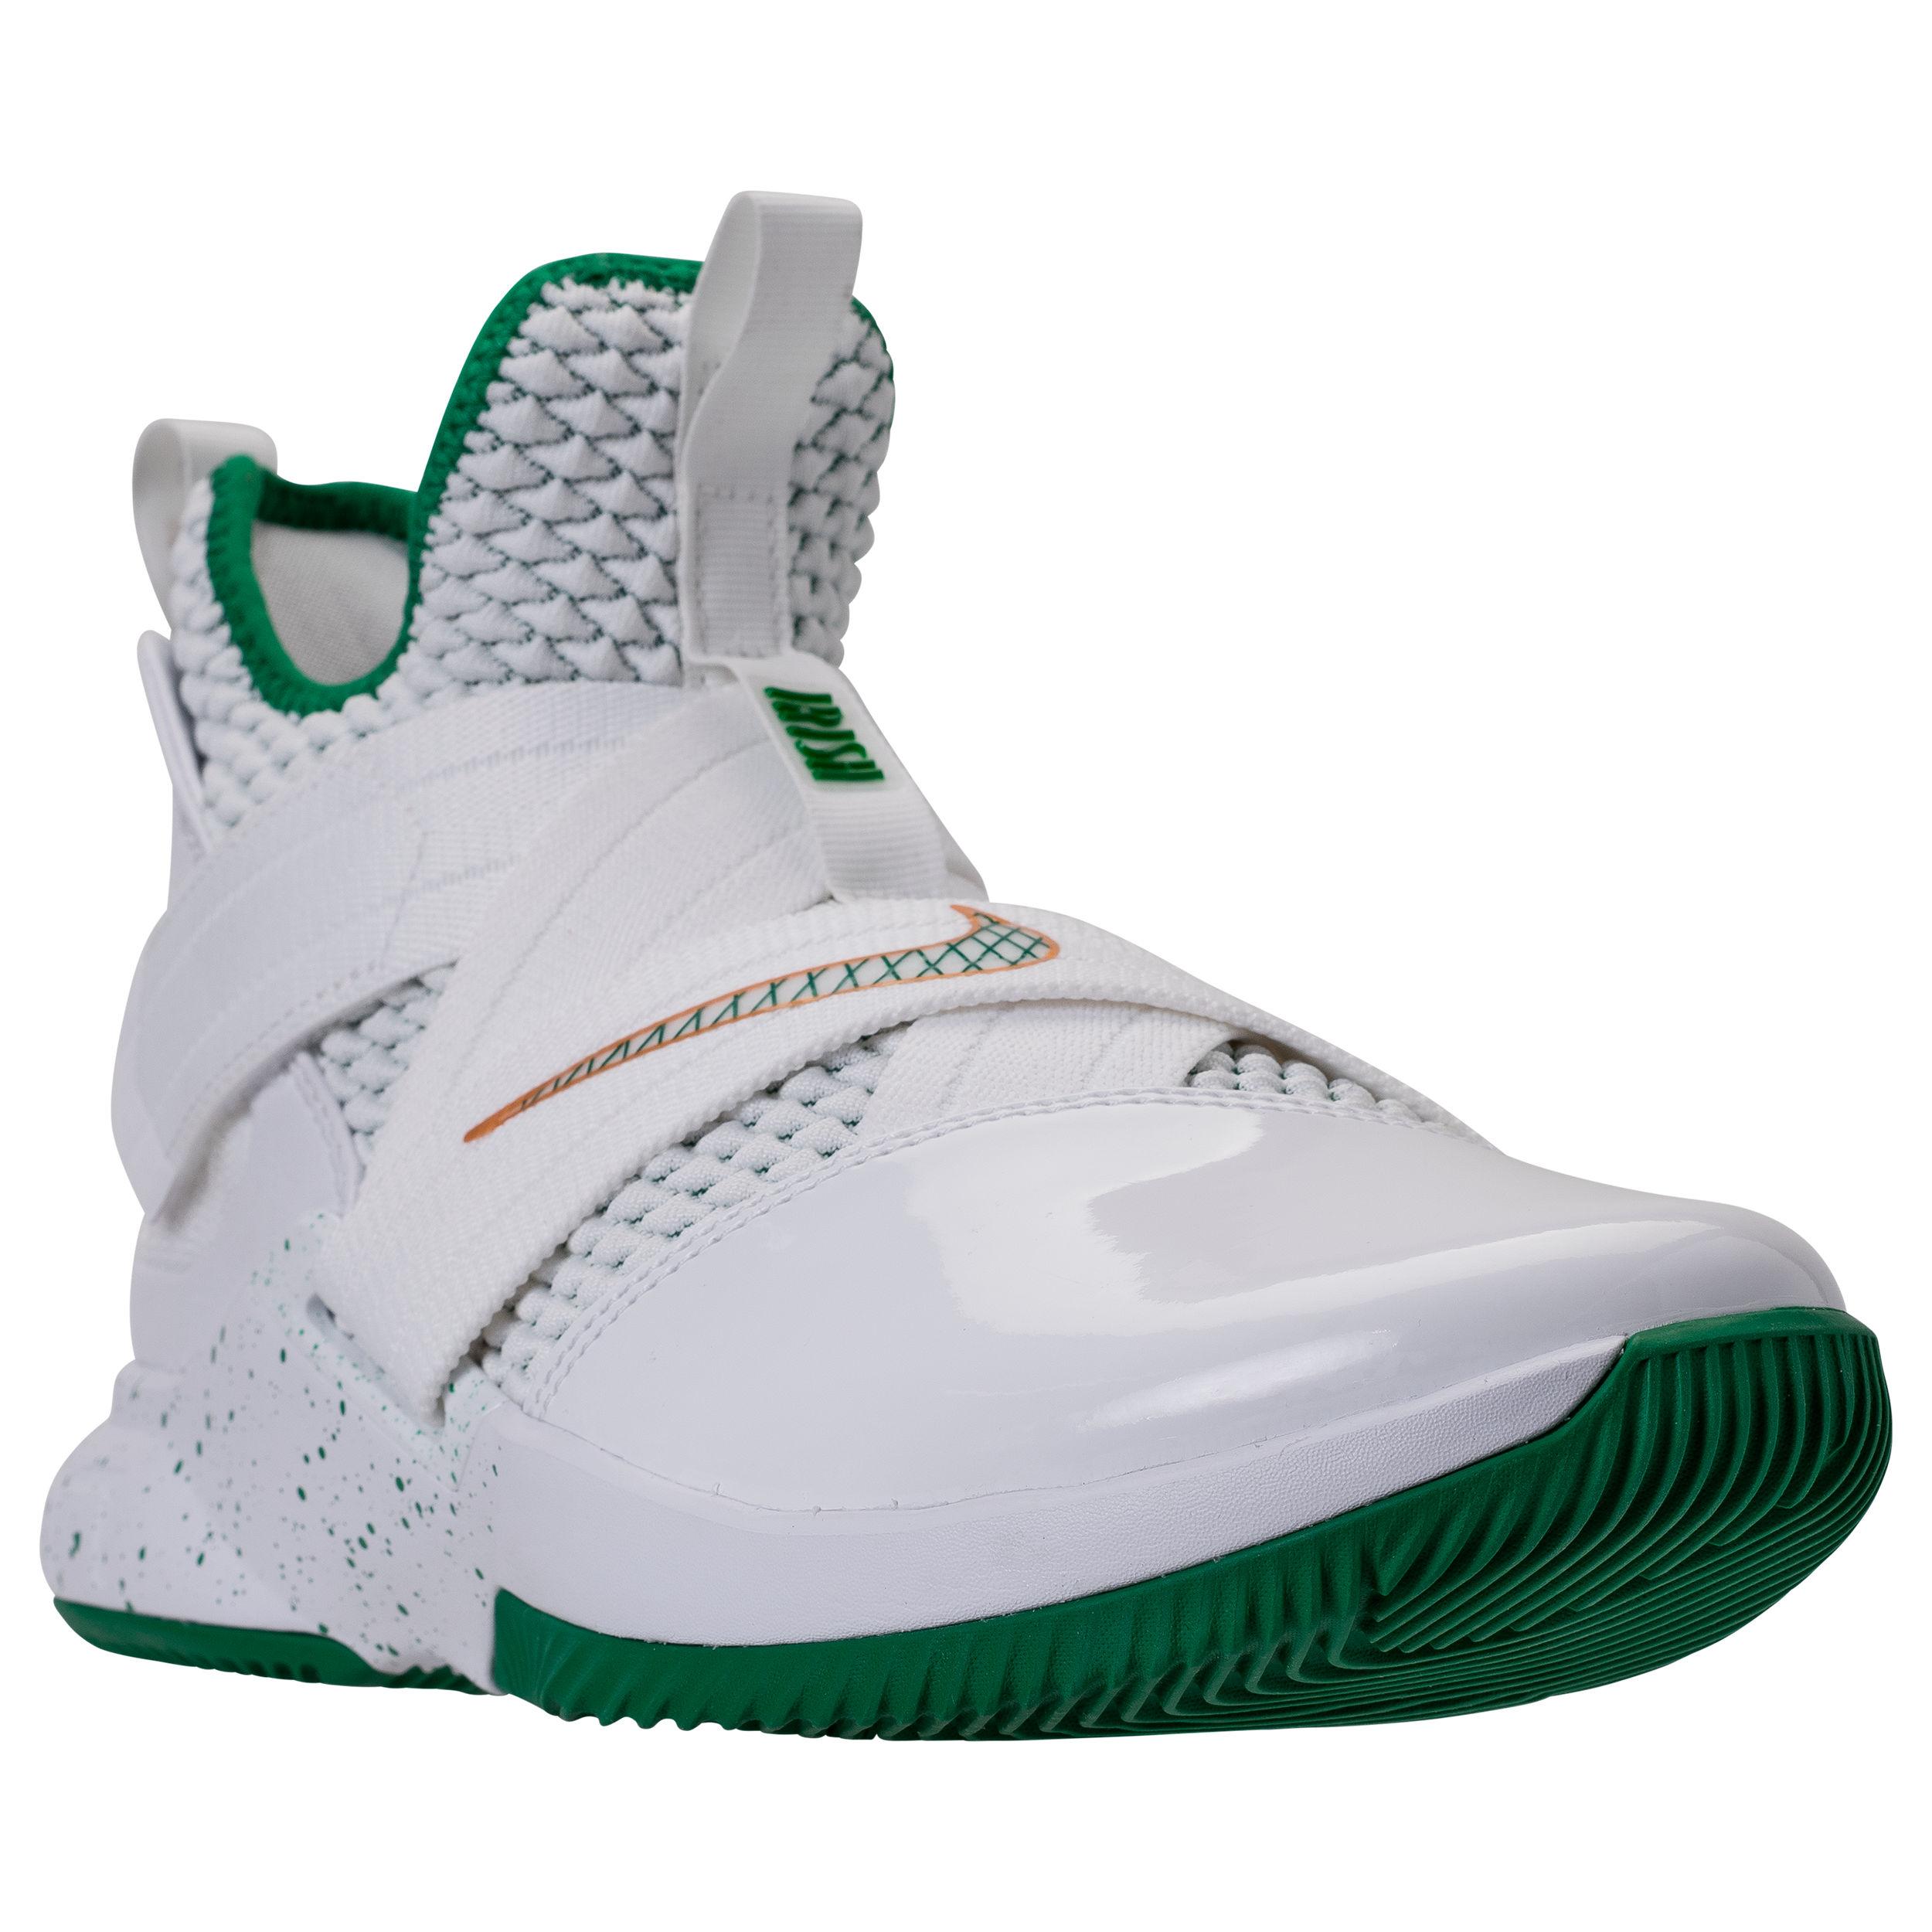 03167c30e5c Nike LeBron Soldier 12 SVSM 2 - WearTesters